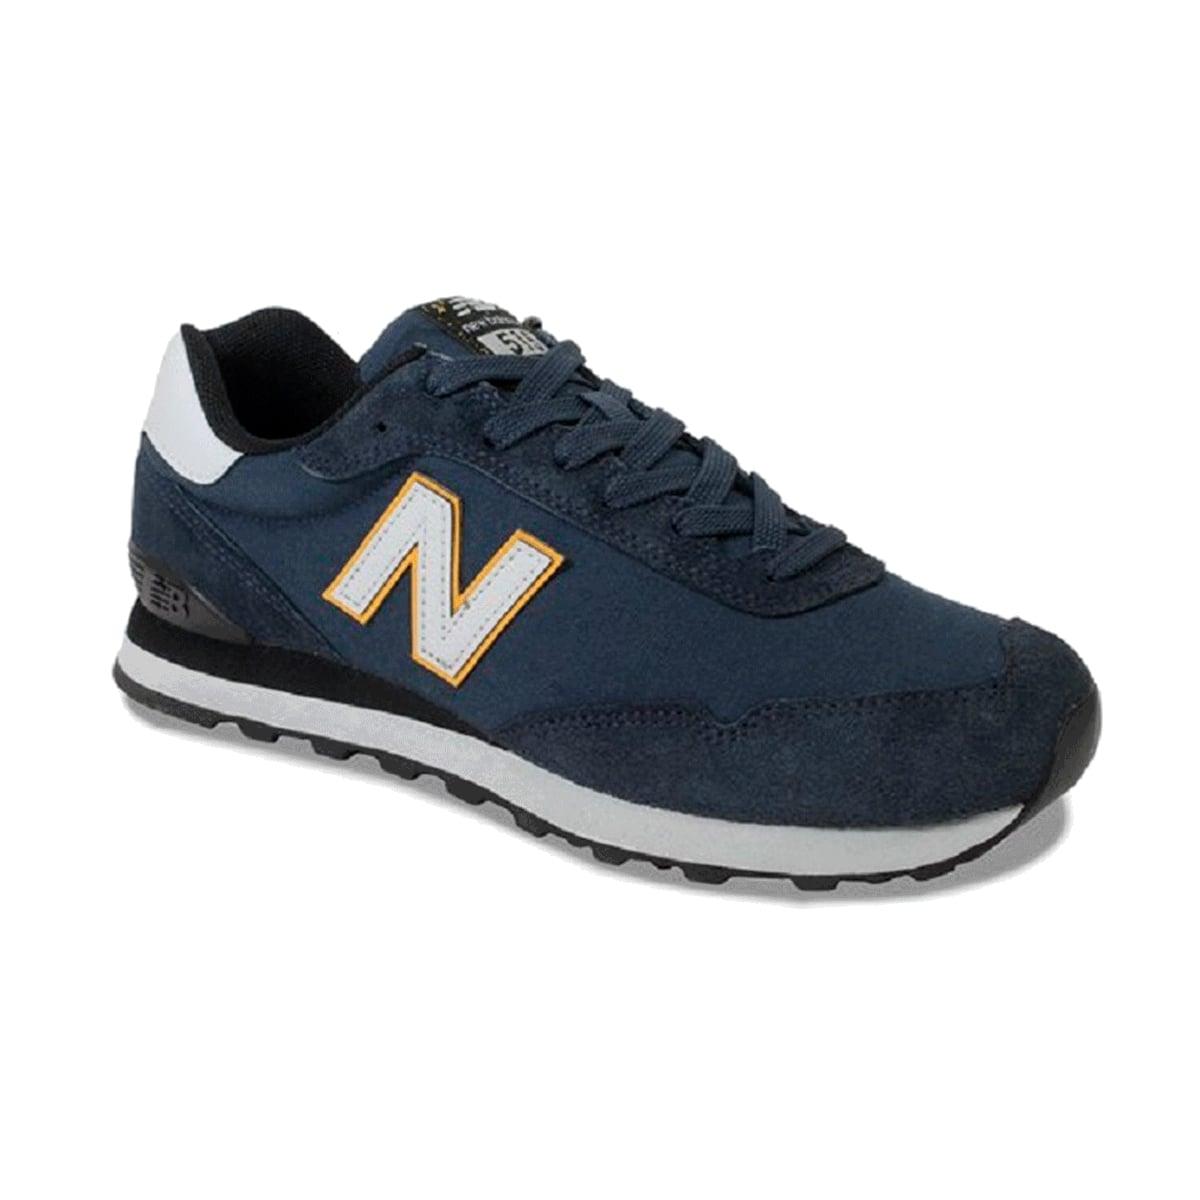 Tênis New Balance 515 Masculino Azul Marinho